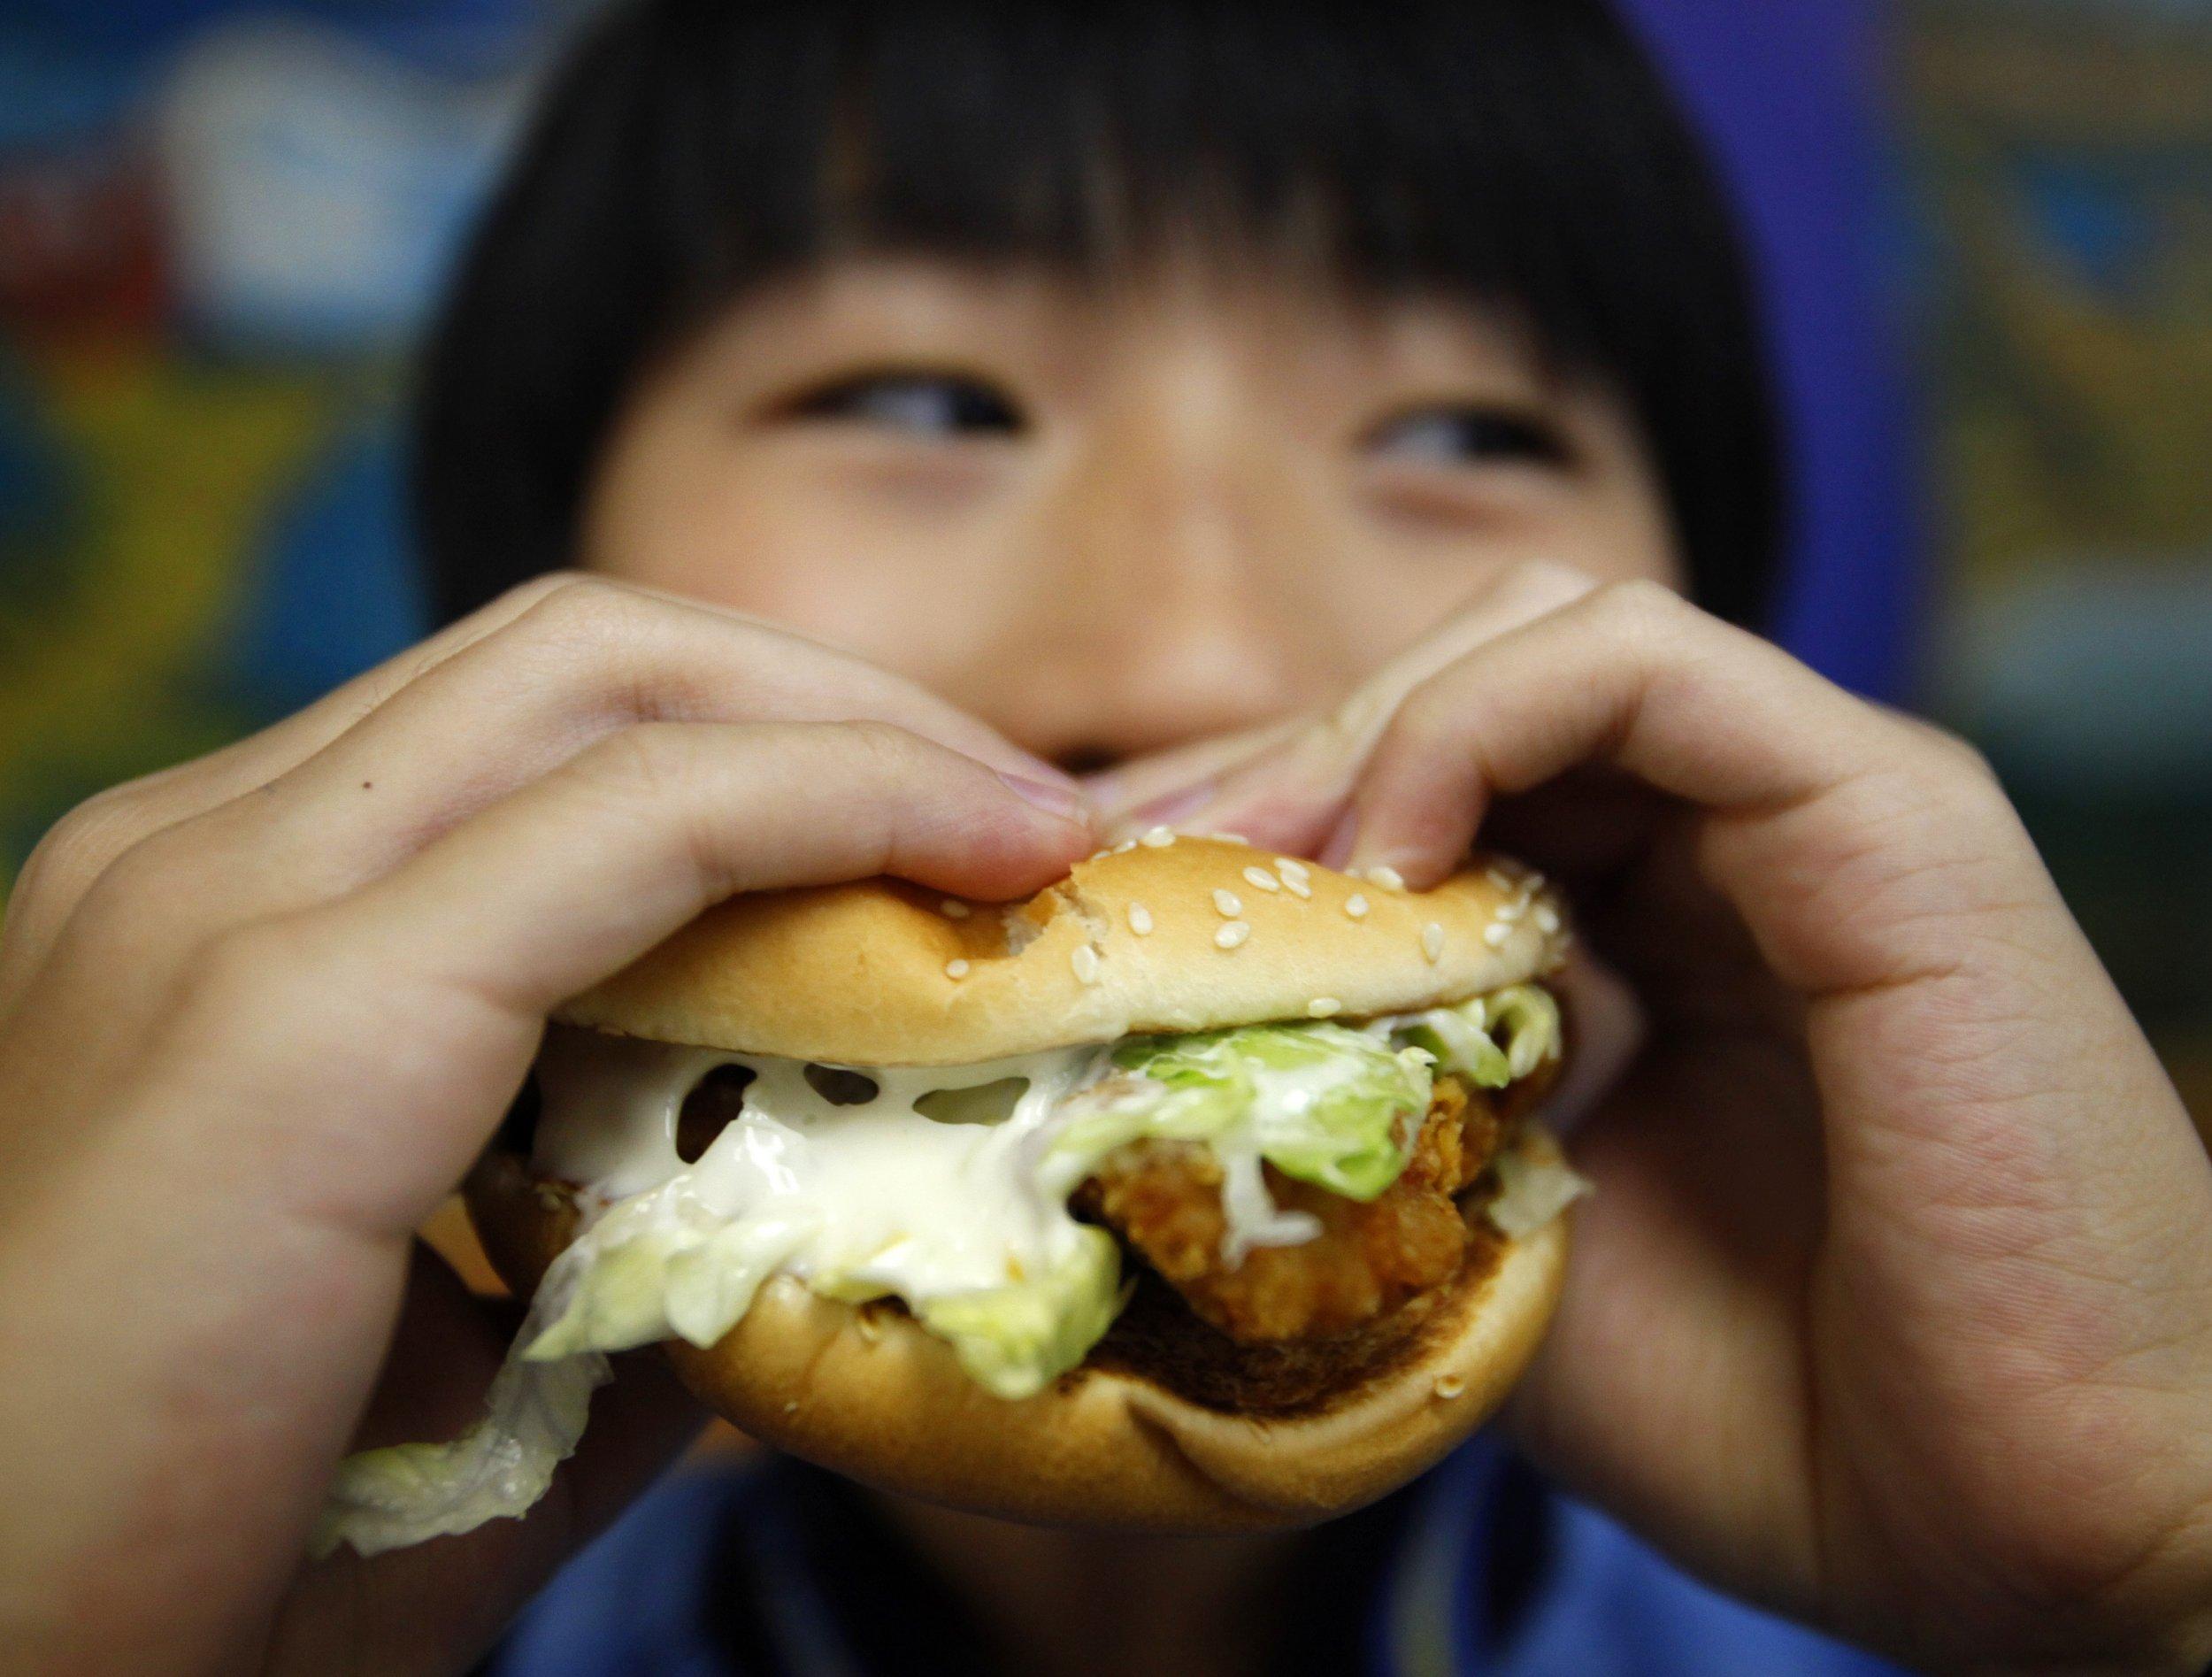 01_09_food_cancer